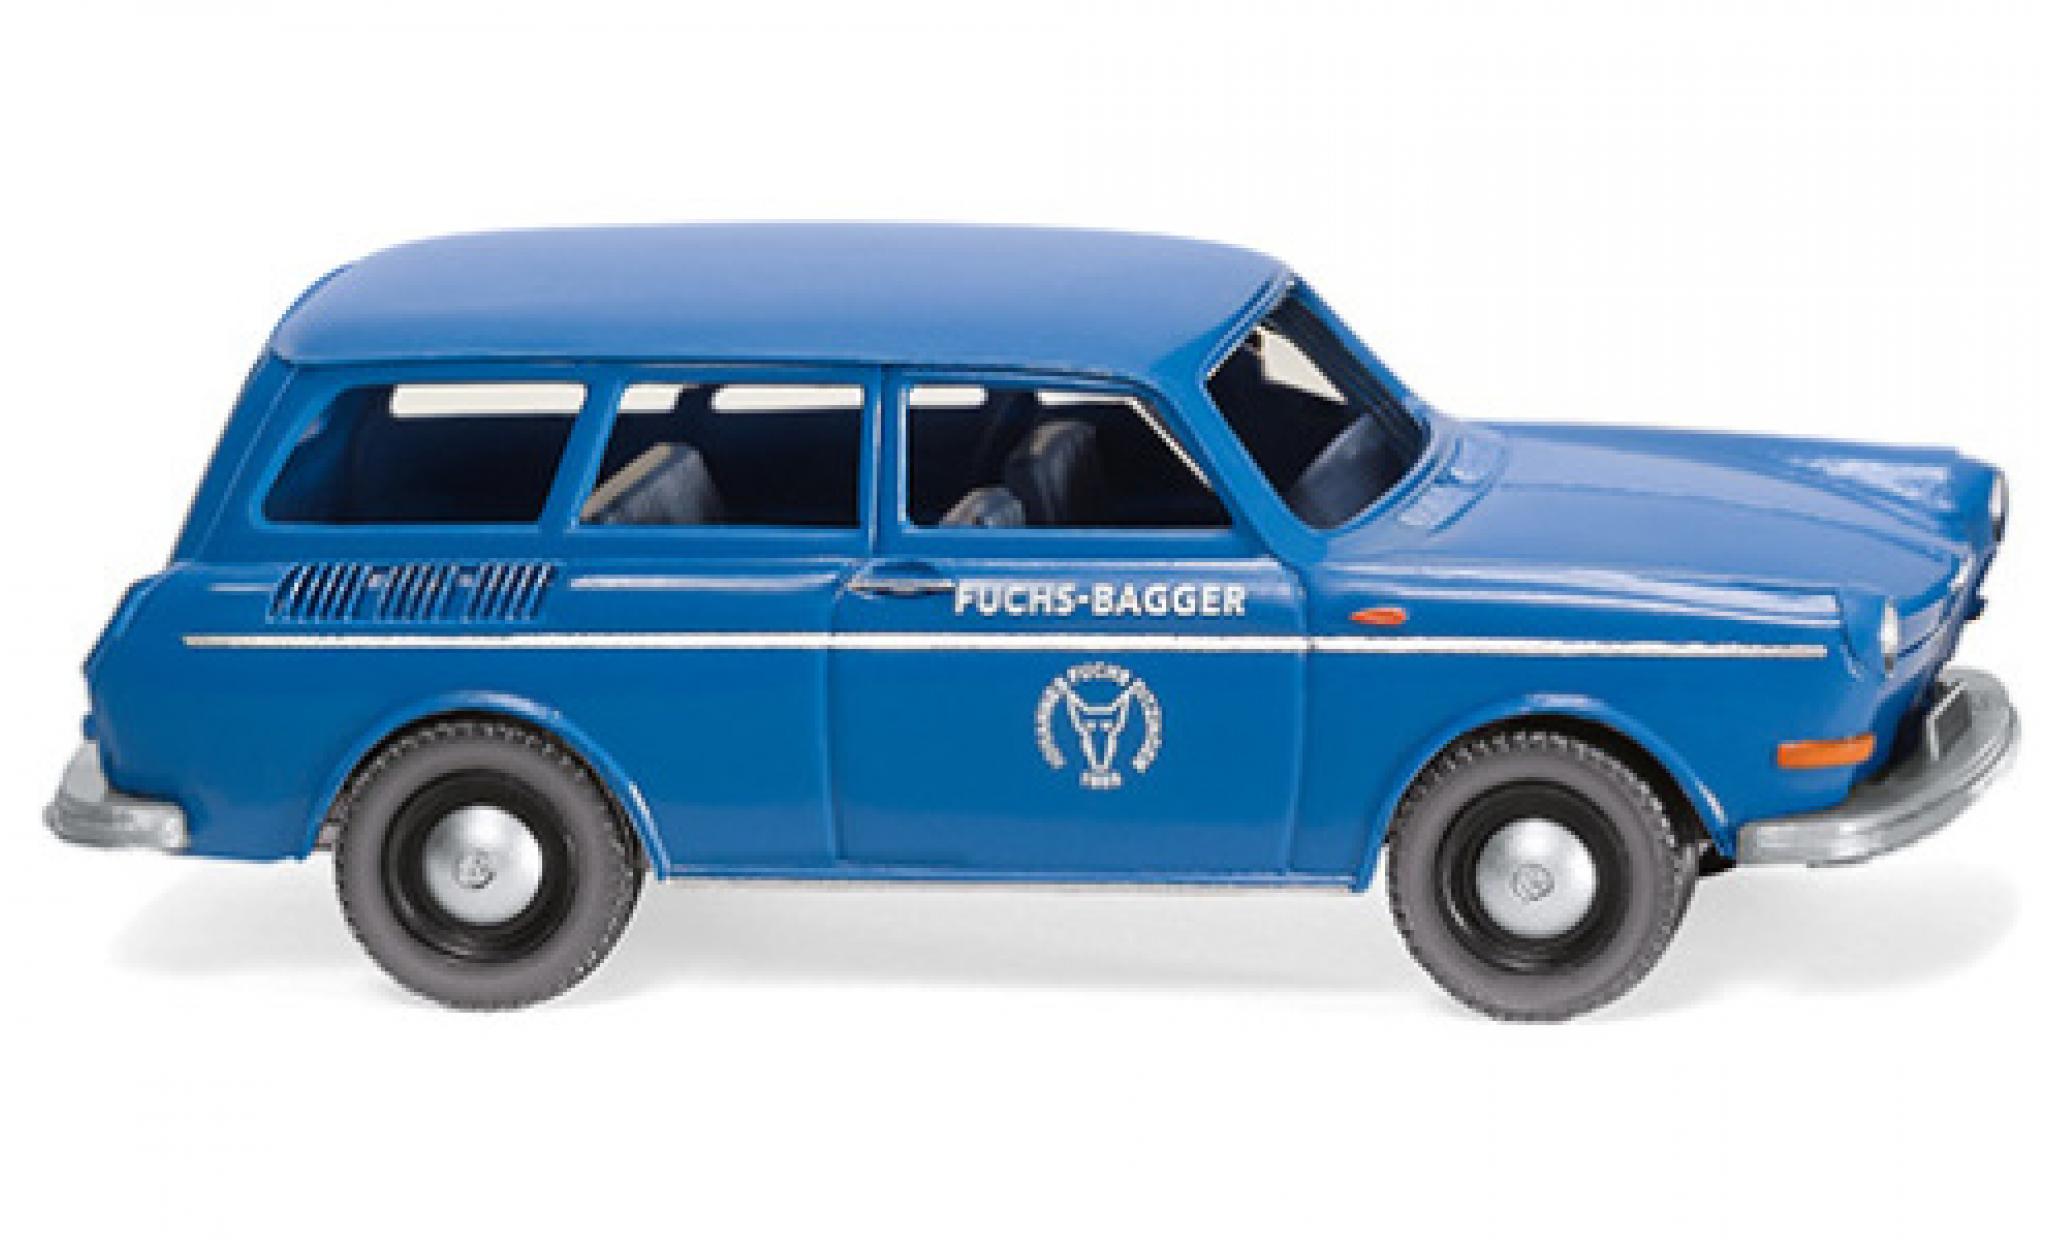 Volkswagen 1600 1/87 Wiking Variant Fuchs-Bagger Kundendienst 1969